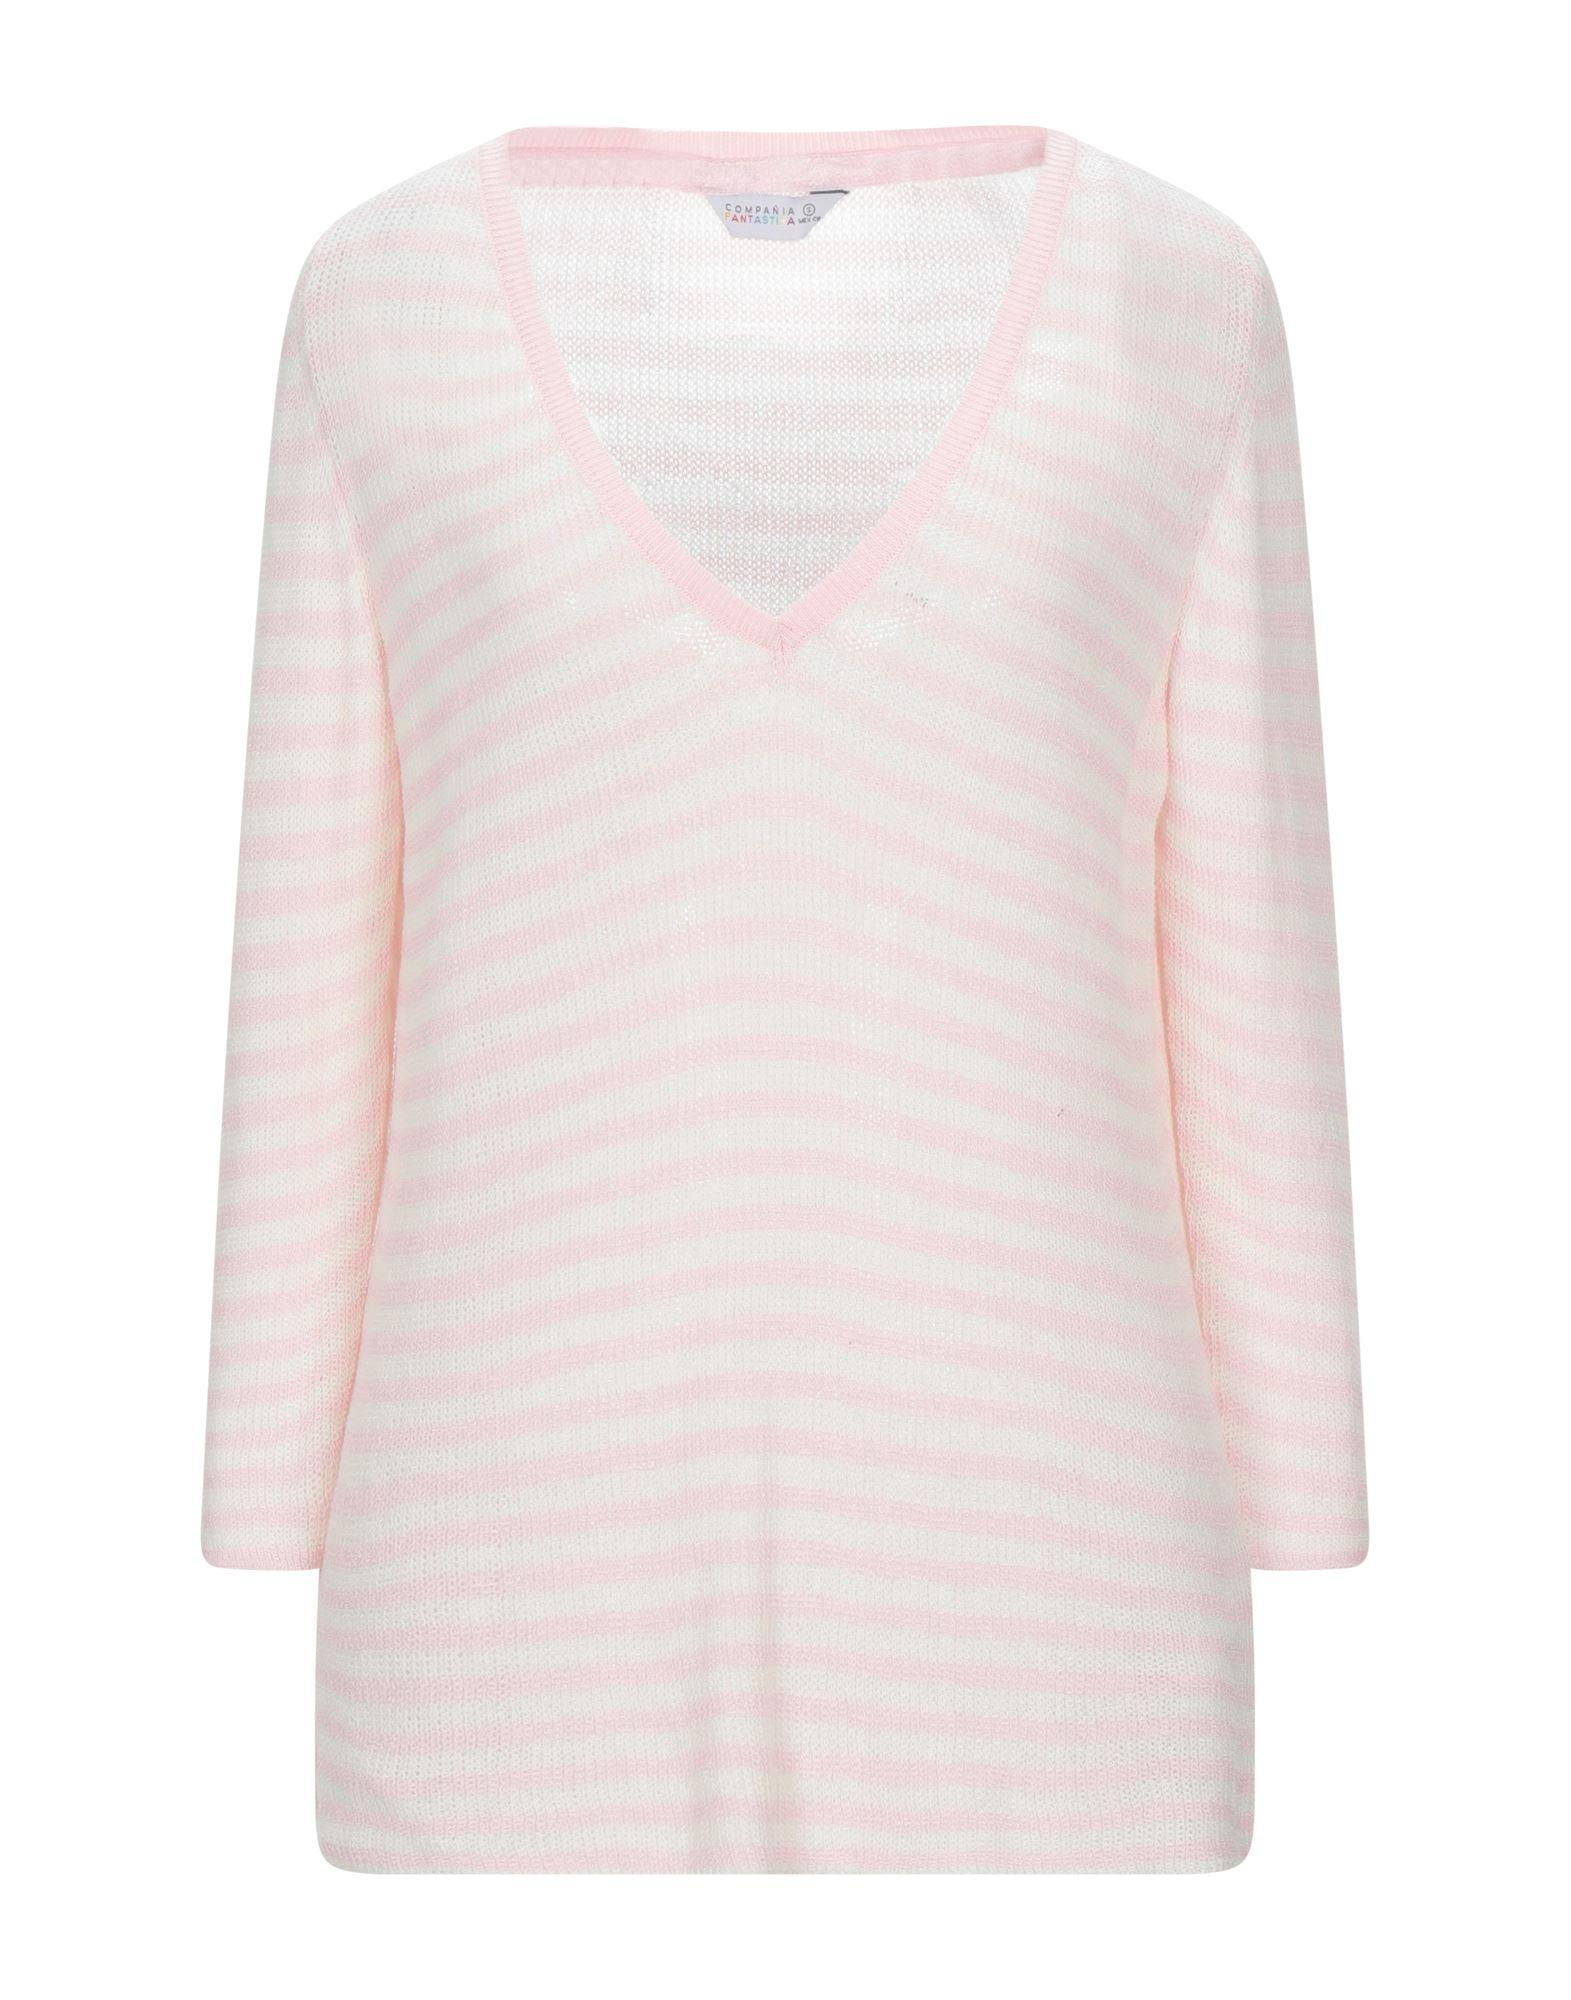 COMPAÑIA FANTASTICA Sweaters - Item 14104787